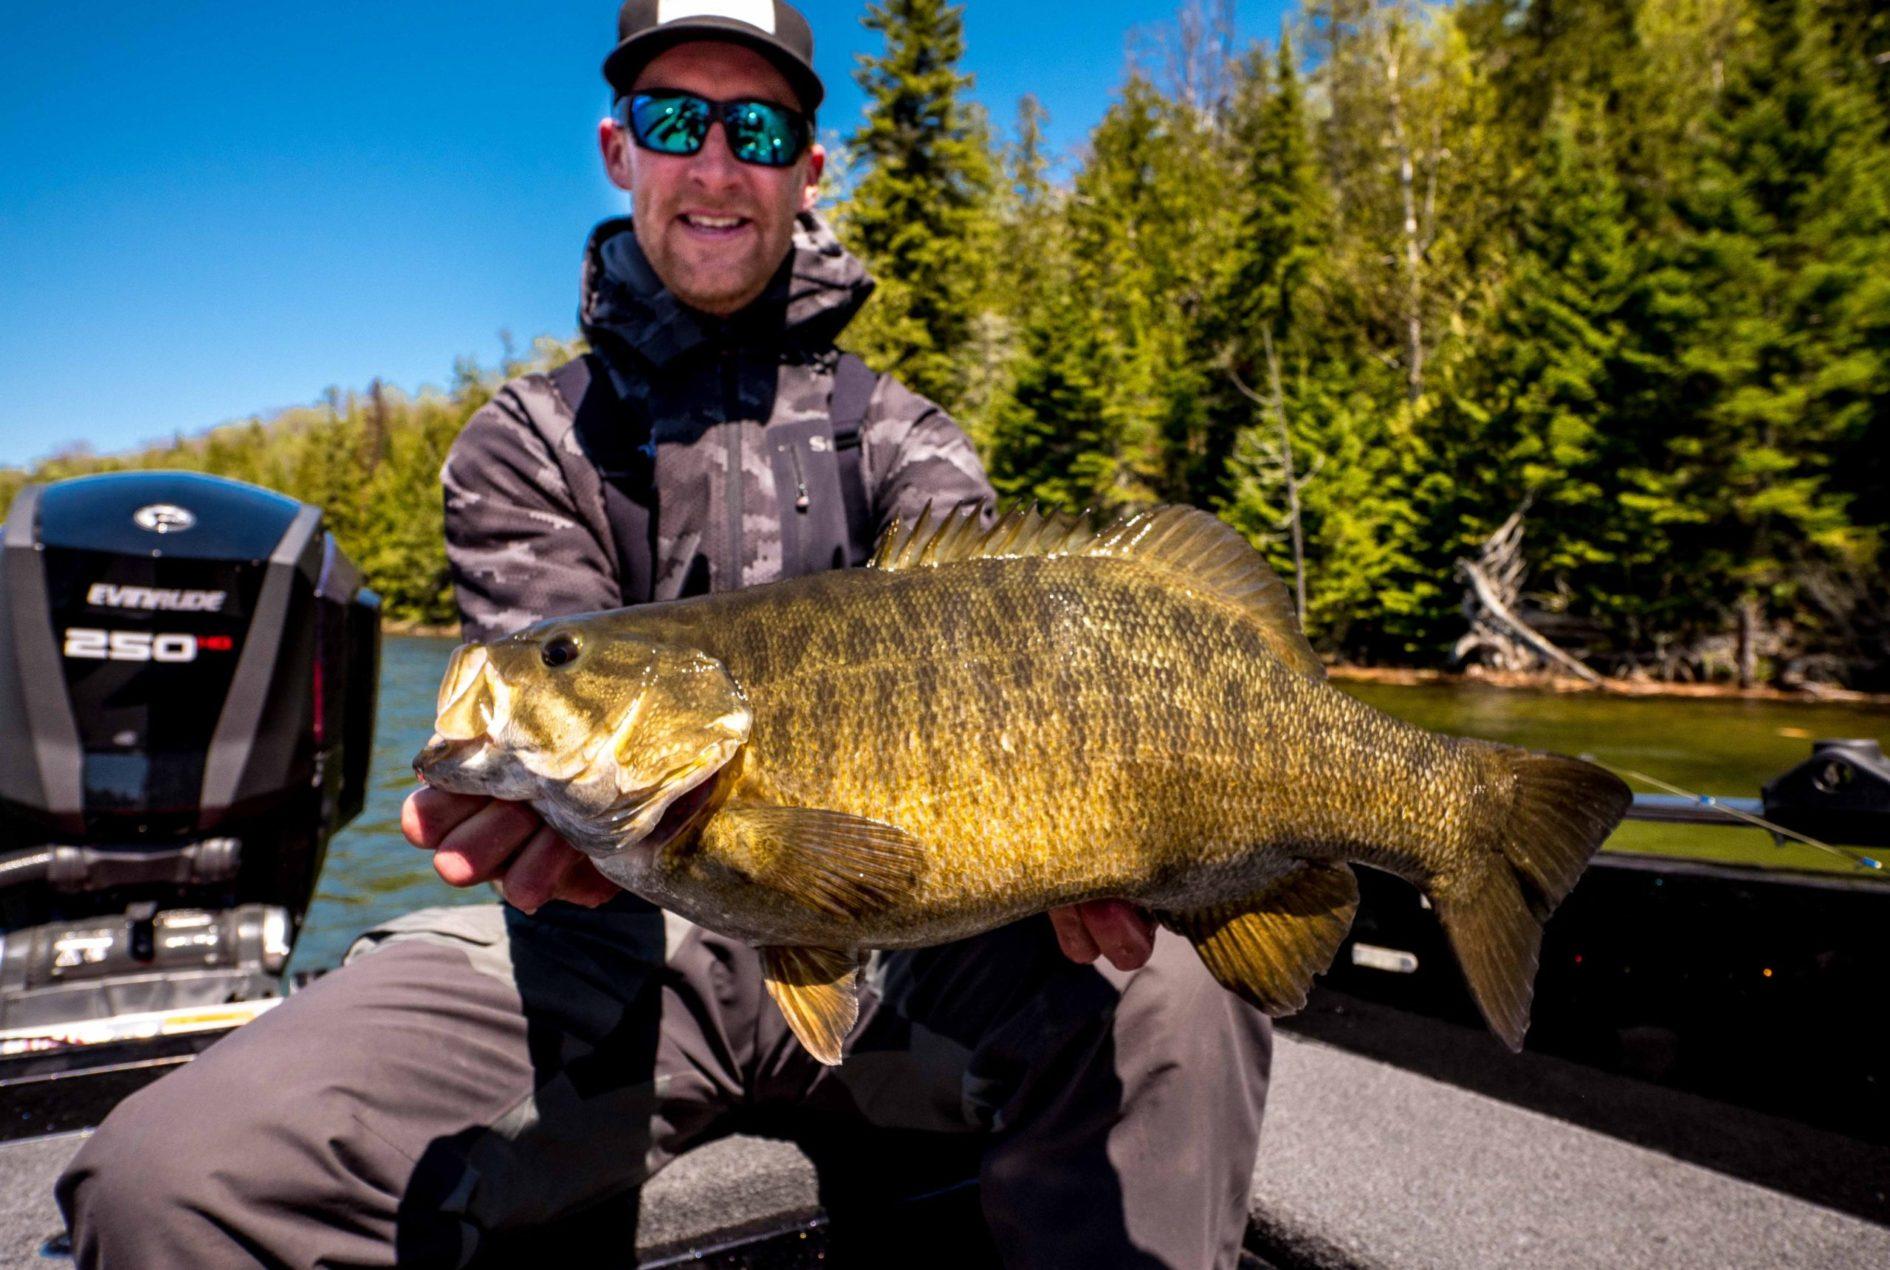 Minnesota bass fishing guide